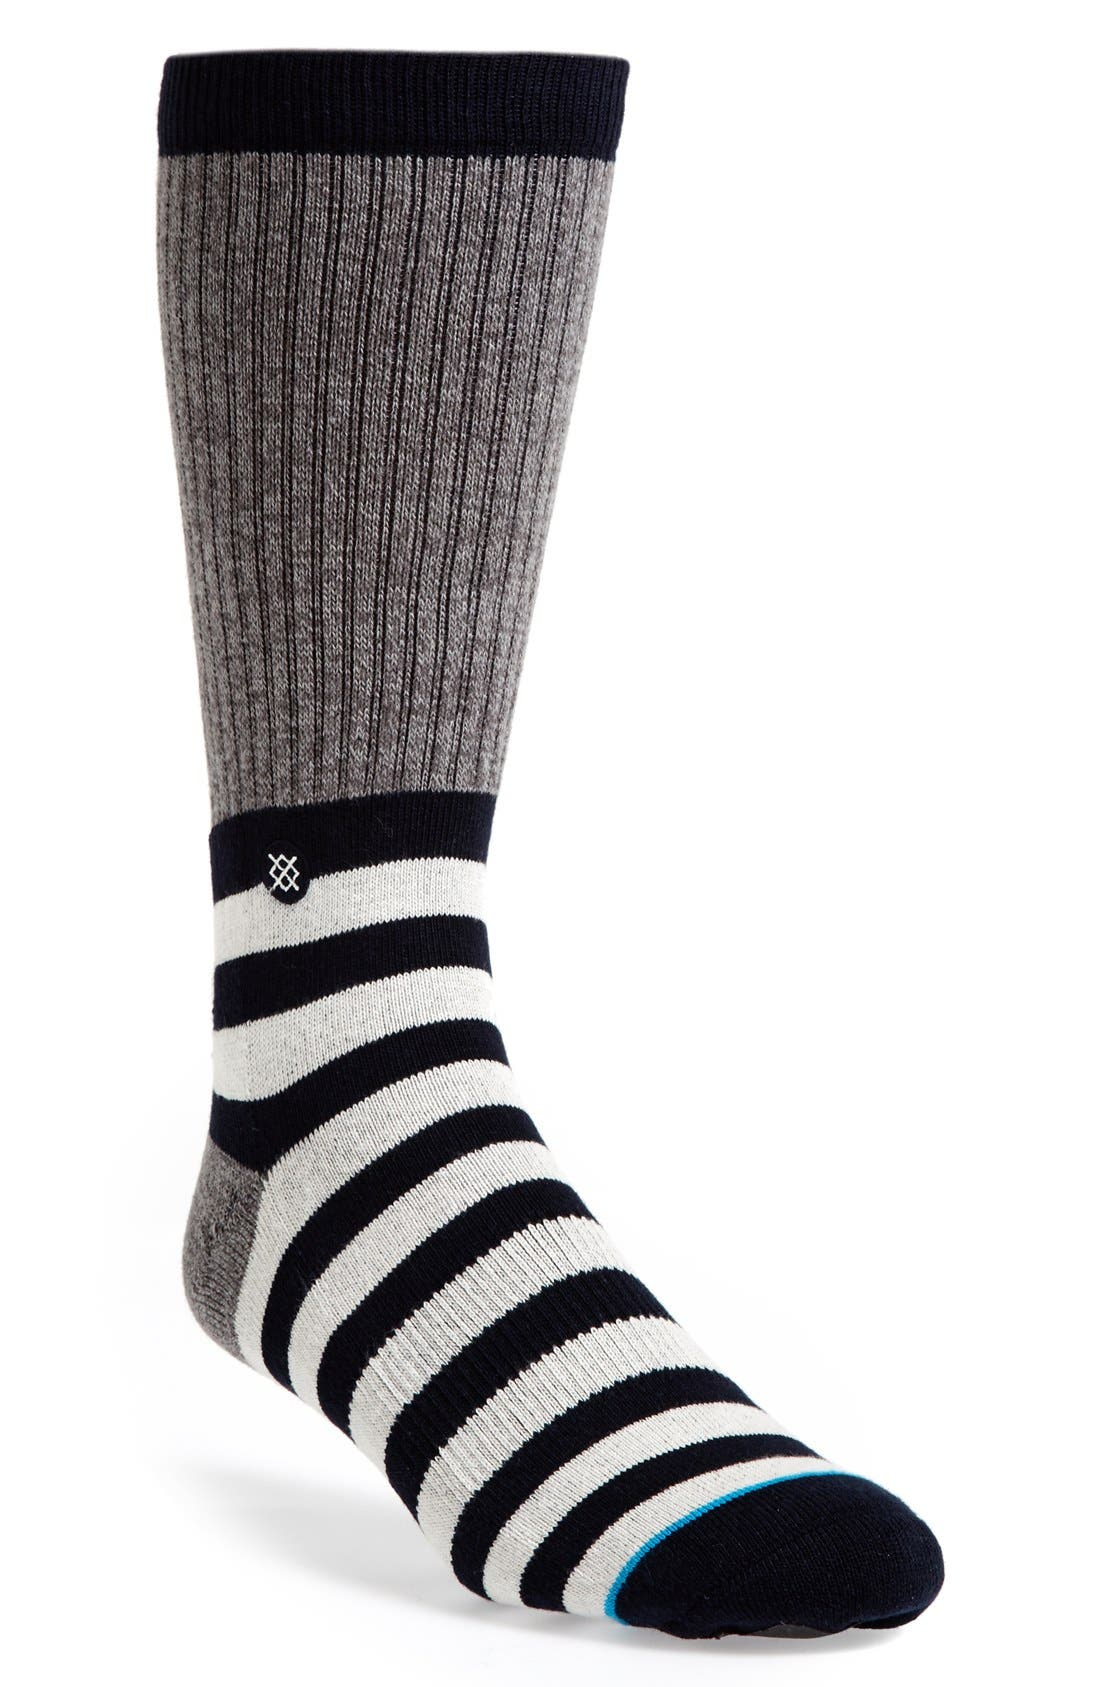 Main Image - Stance 'Shoreman' Socks